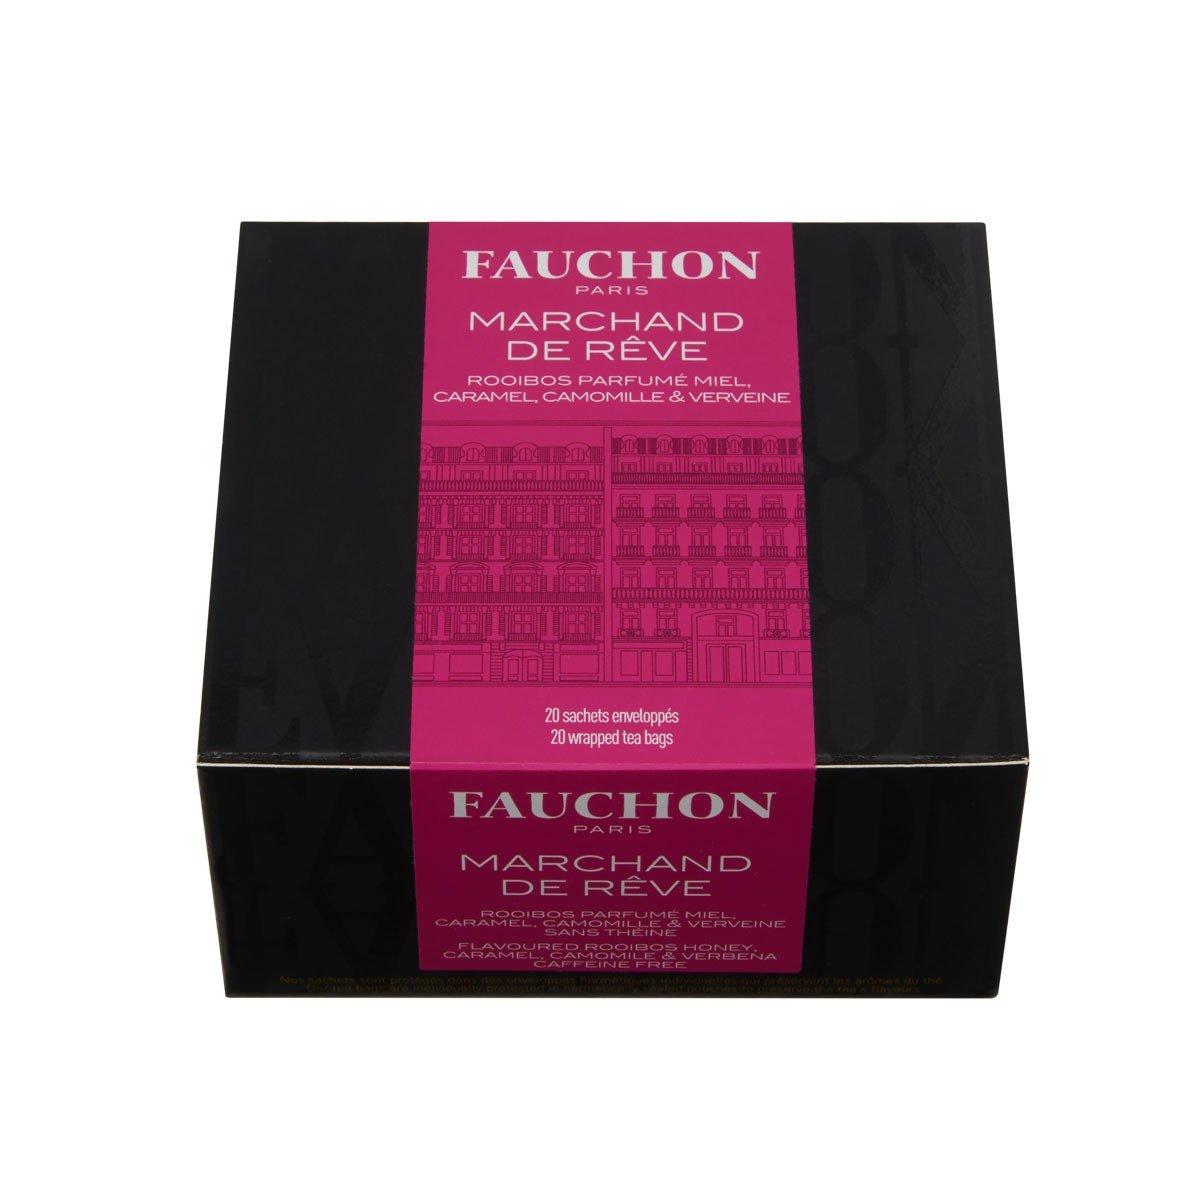 FAUCHON TEA PARIS - Sandman Rooibos / Marchand de Rêve Tea - 20 Tea Bags by Unknown